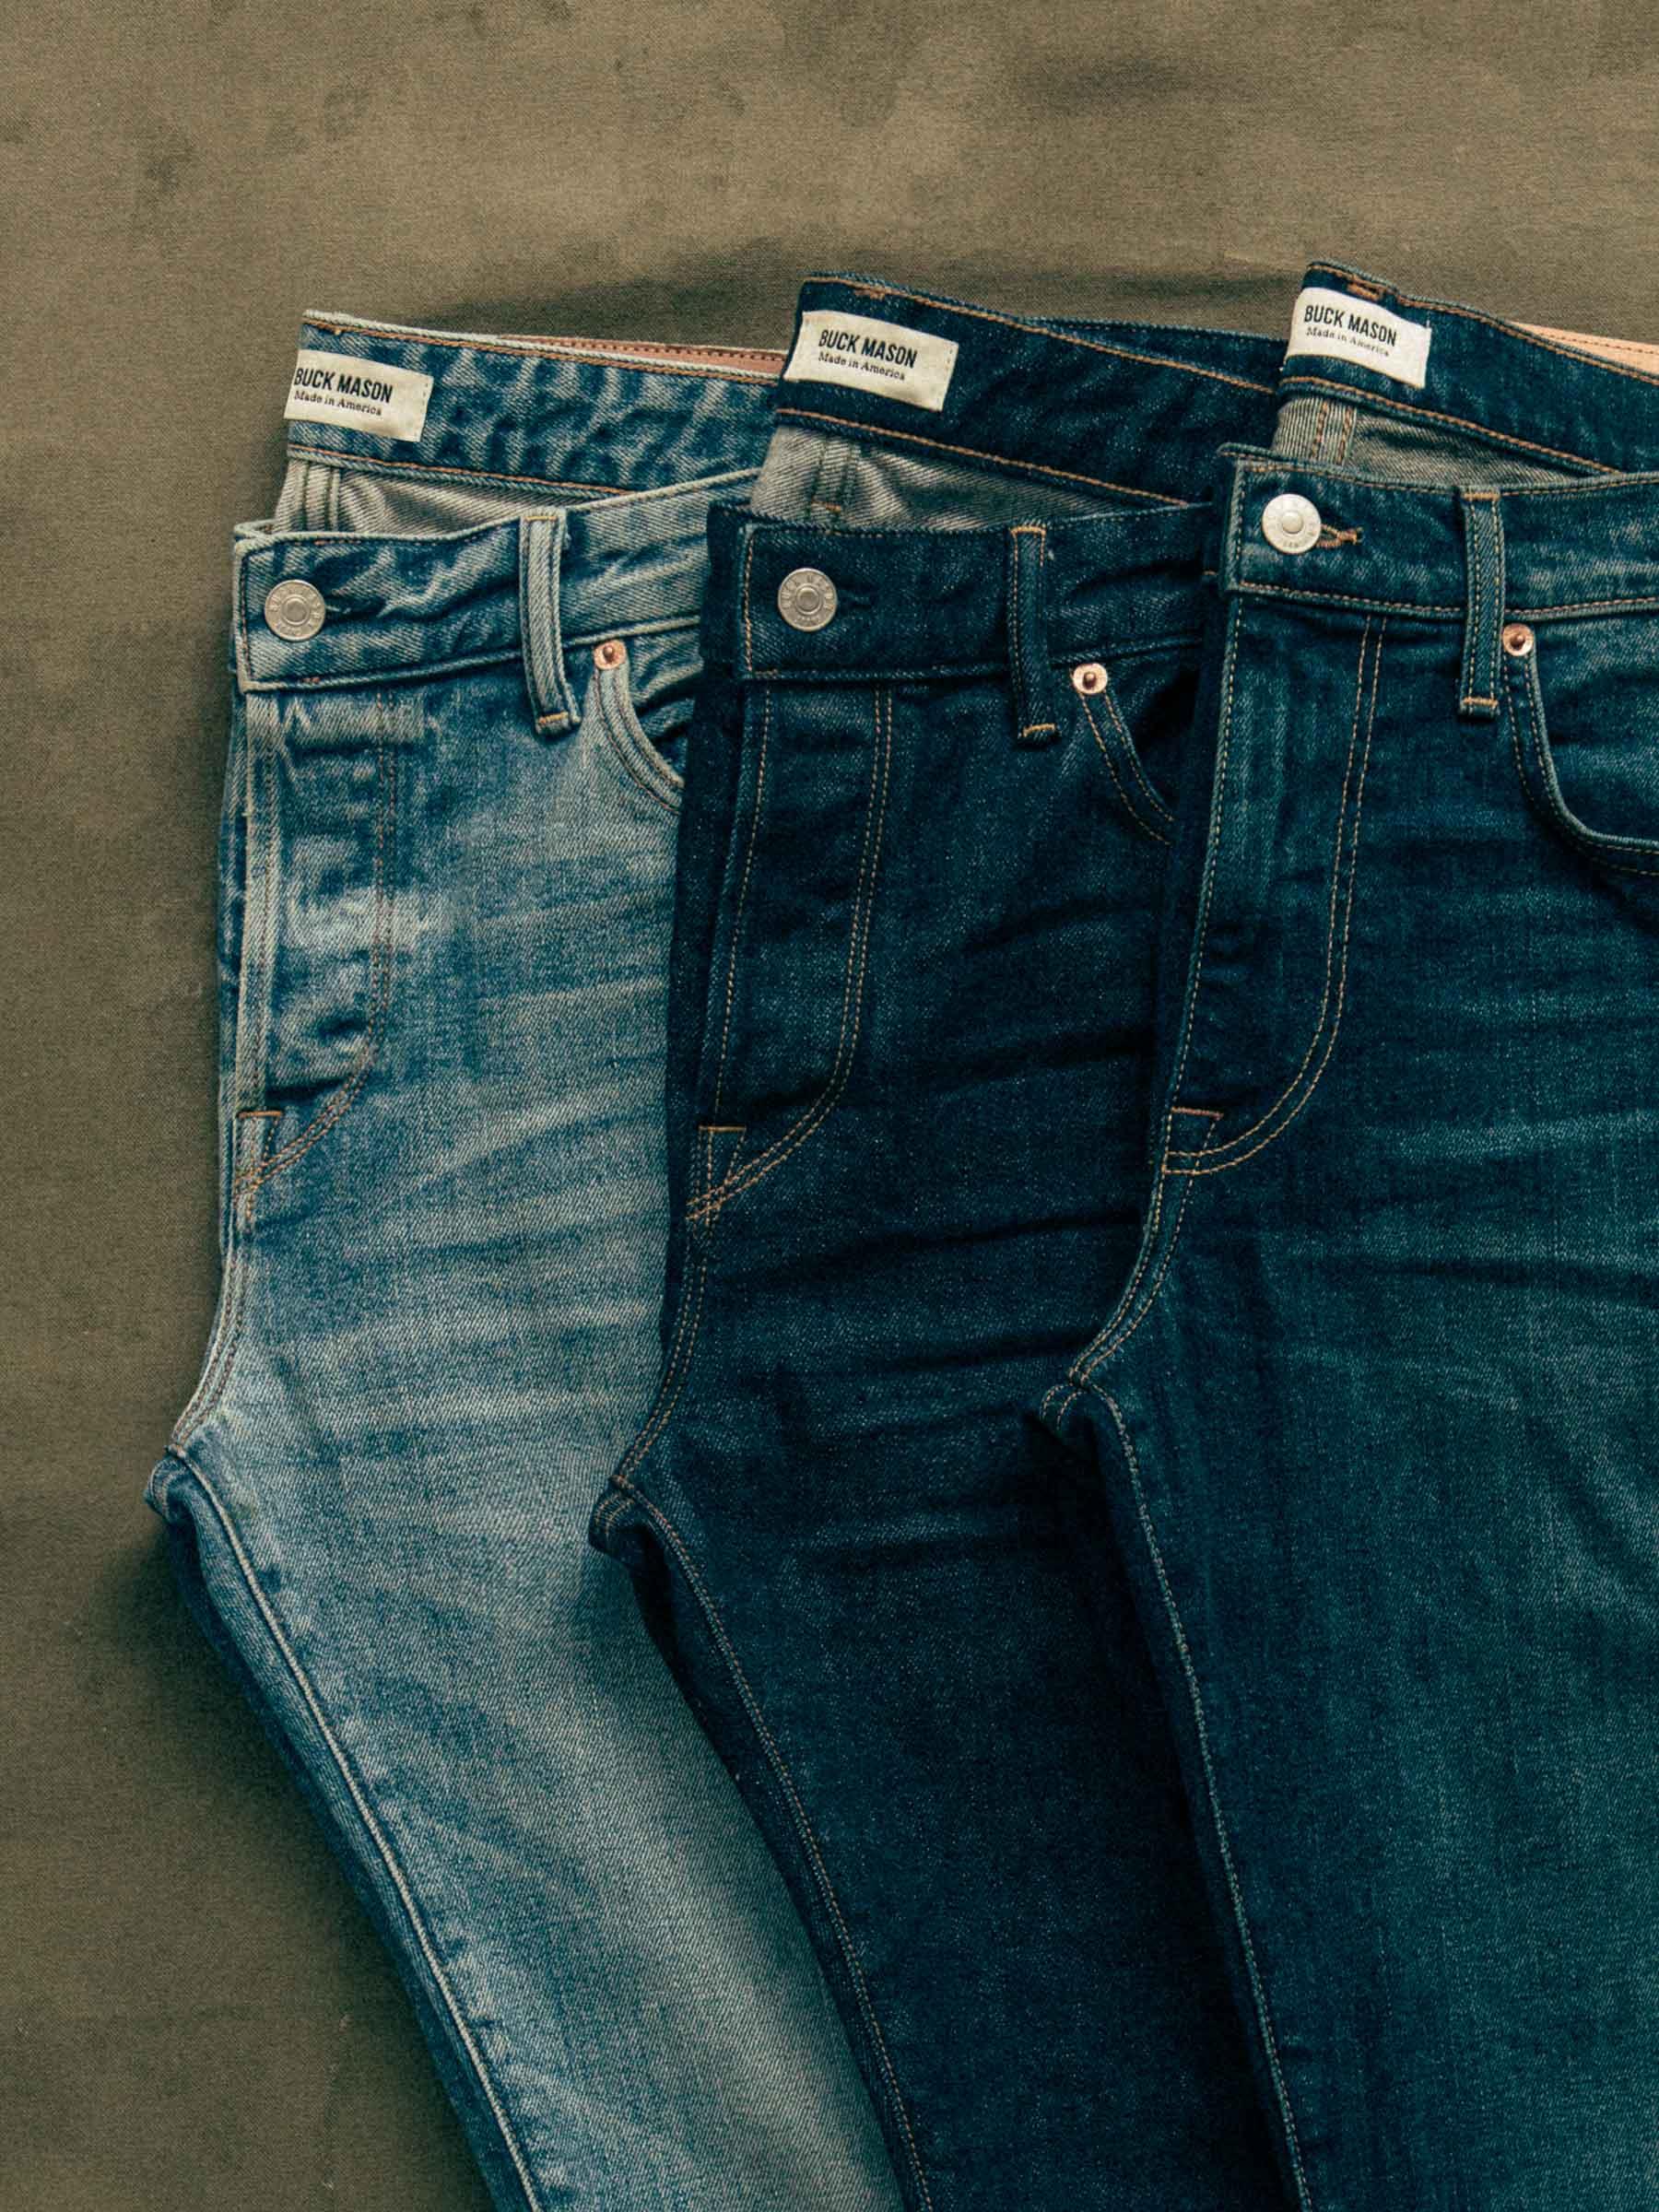 Buck Mason - Black Standard Jean